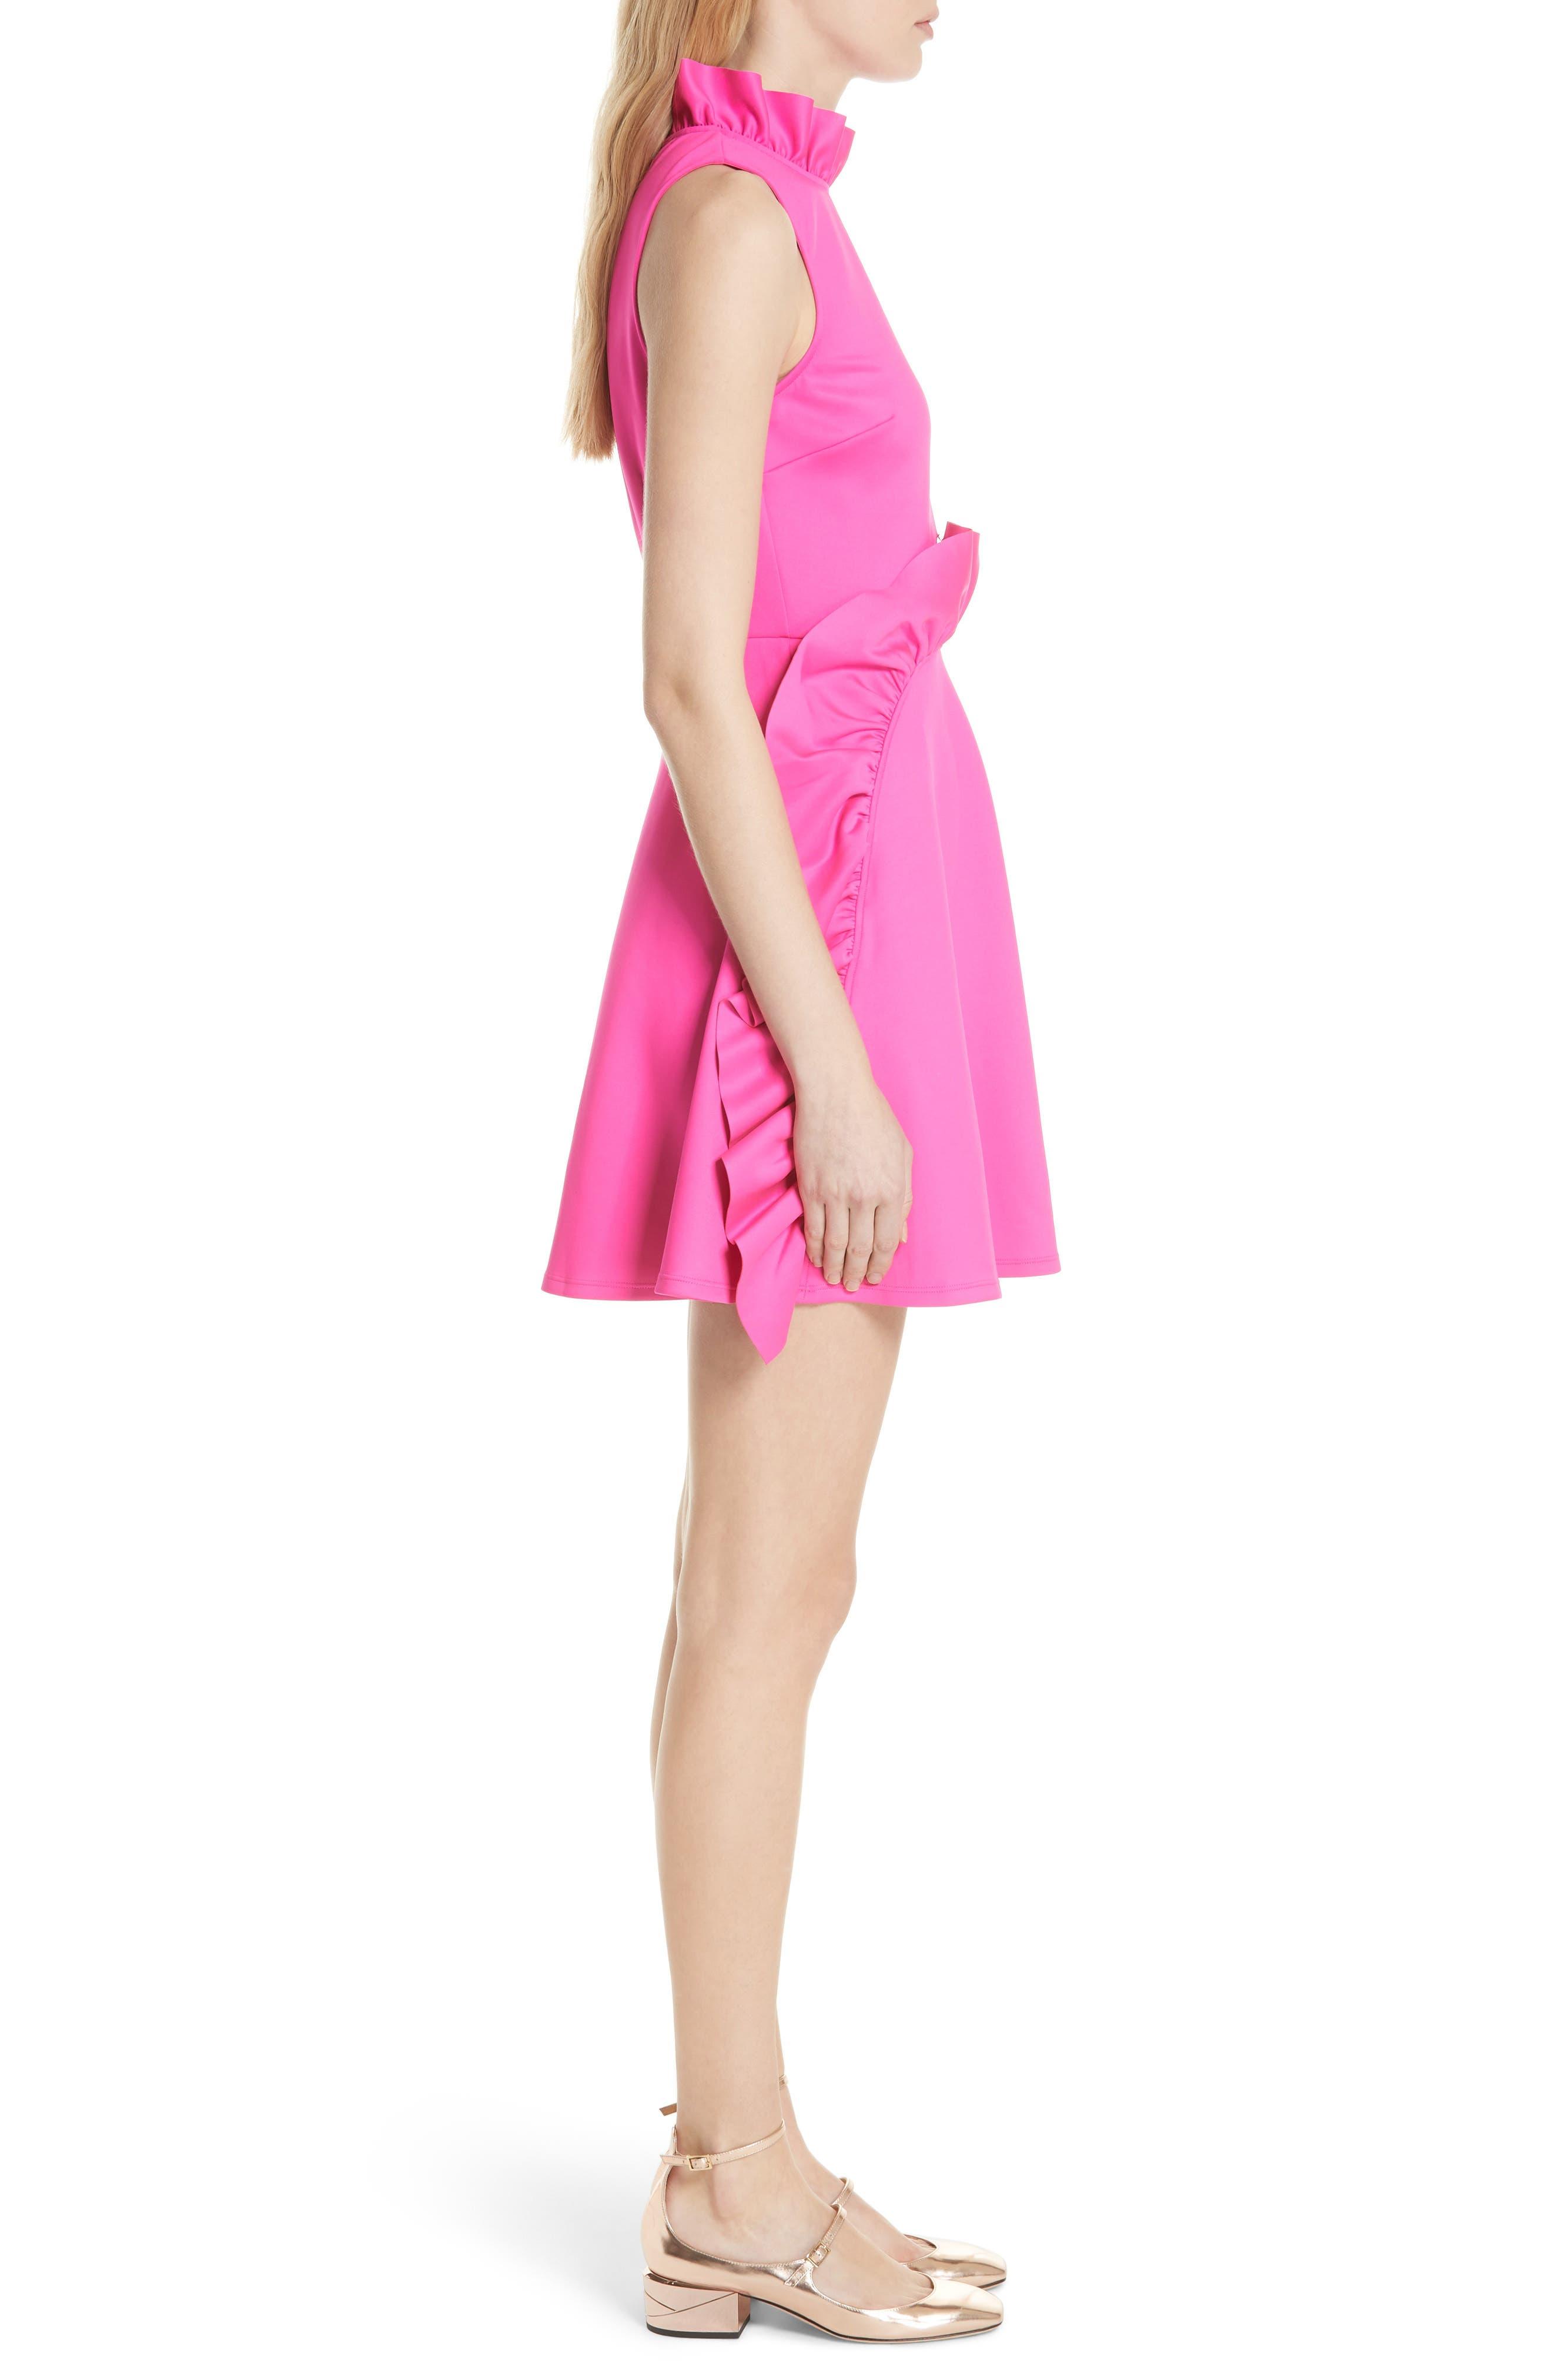 Jannett Laser Cut Ruffle Dress,                             Alternate thumbnail 3, color,                             671